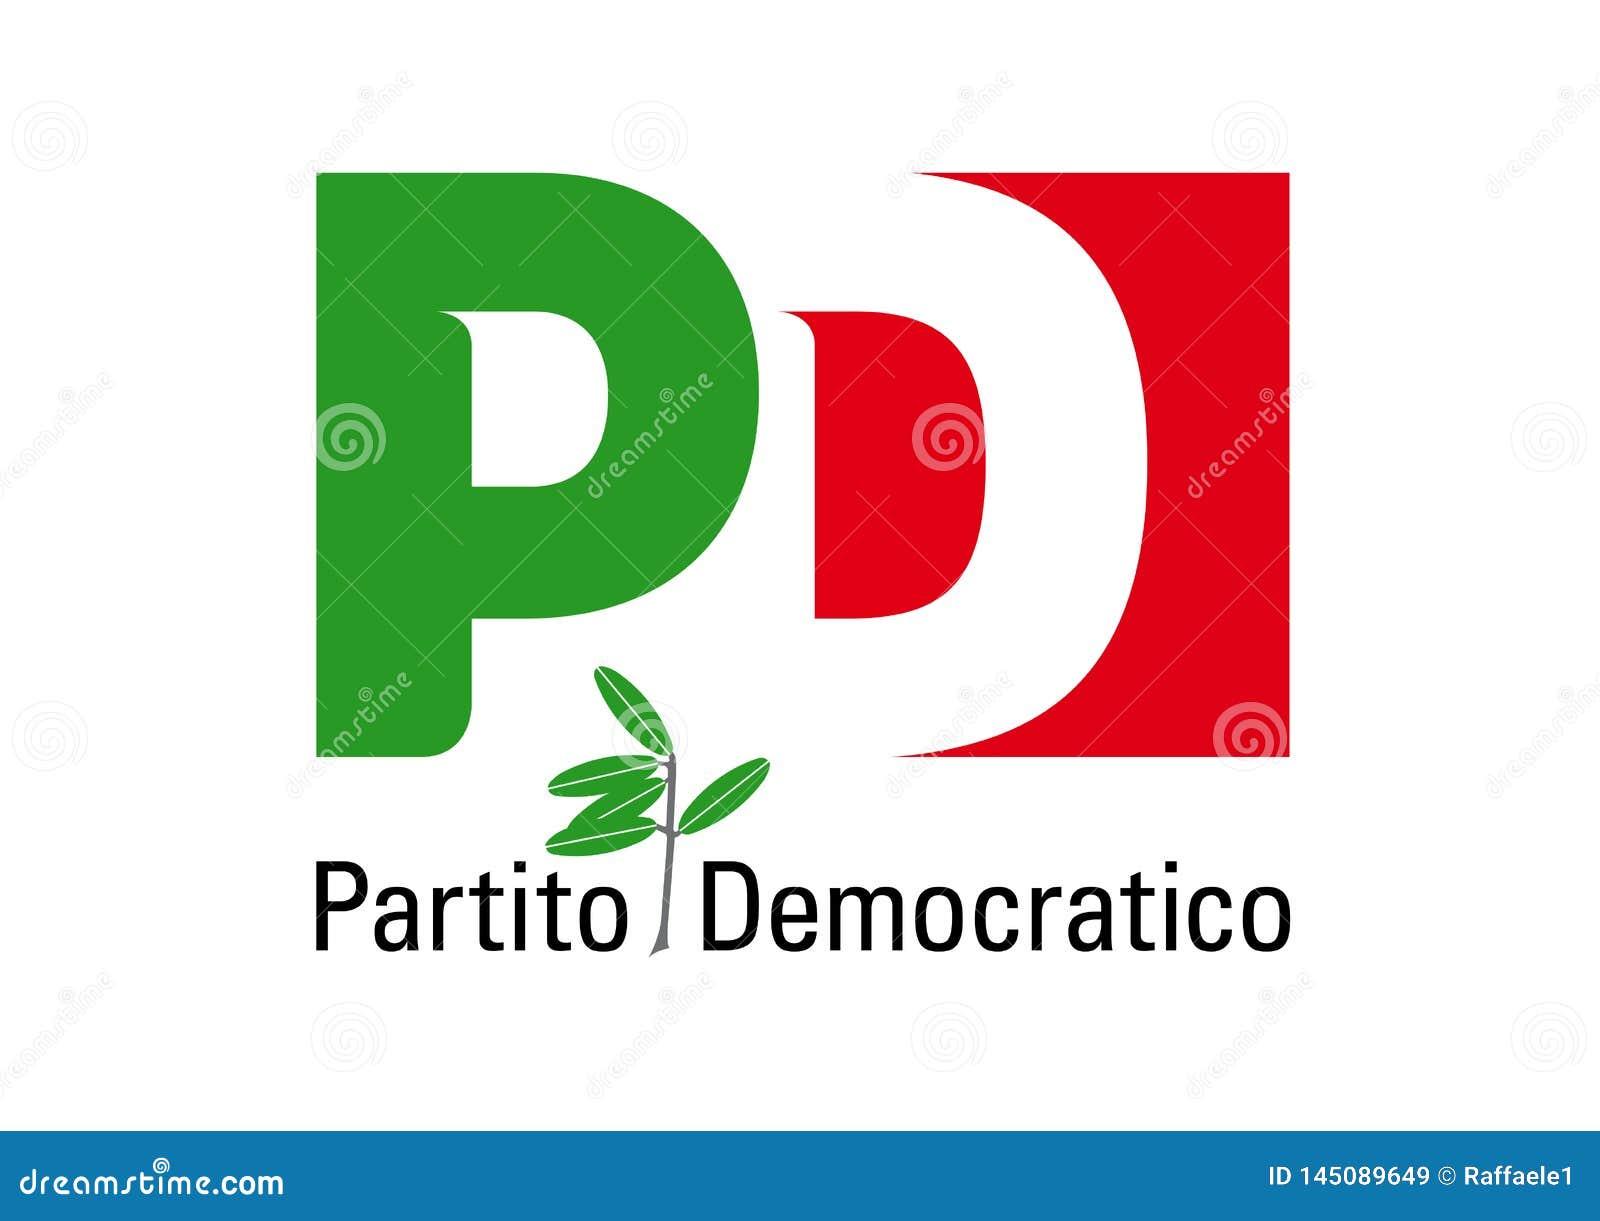 Logo du Partito Democratico, parti politique italien